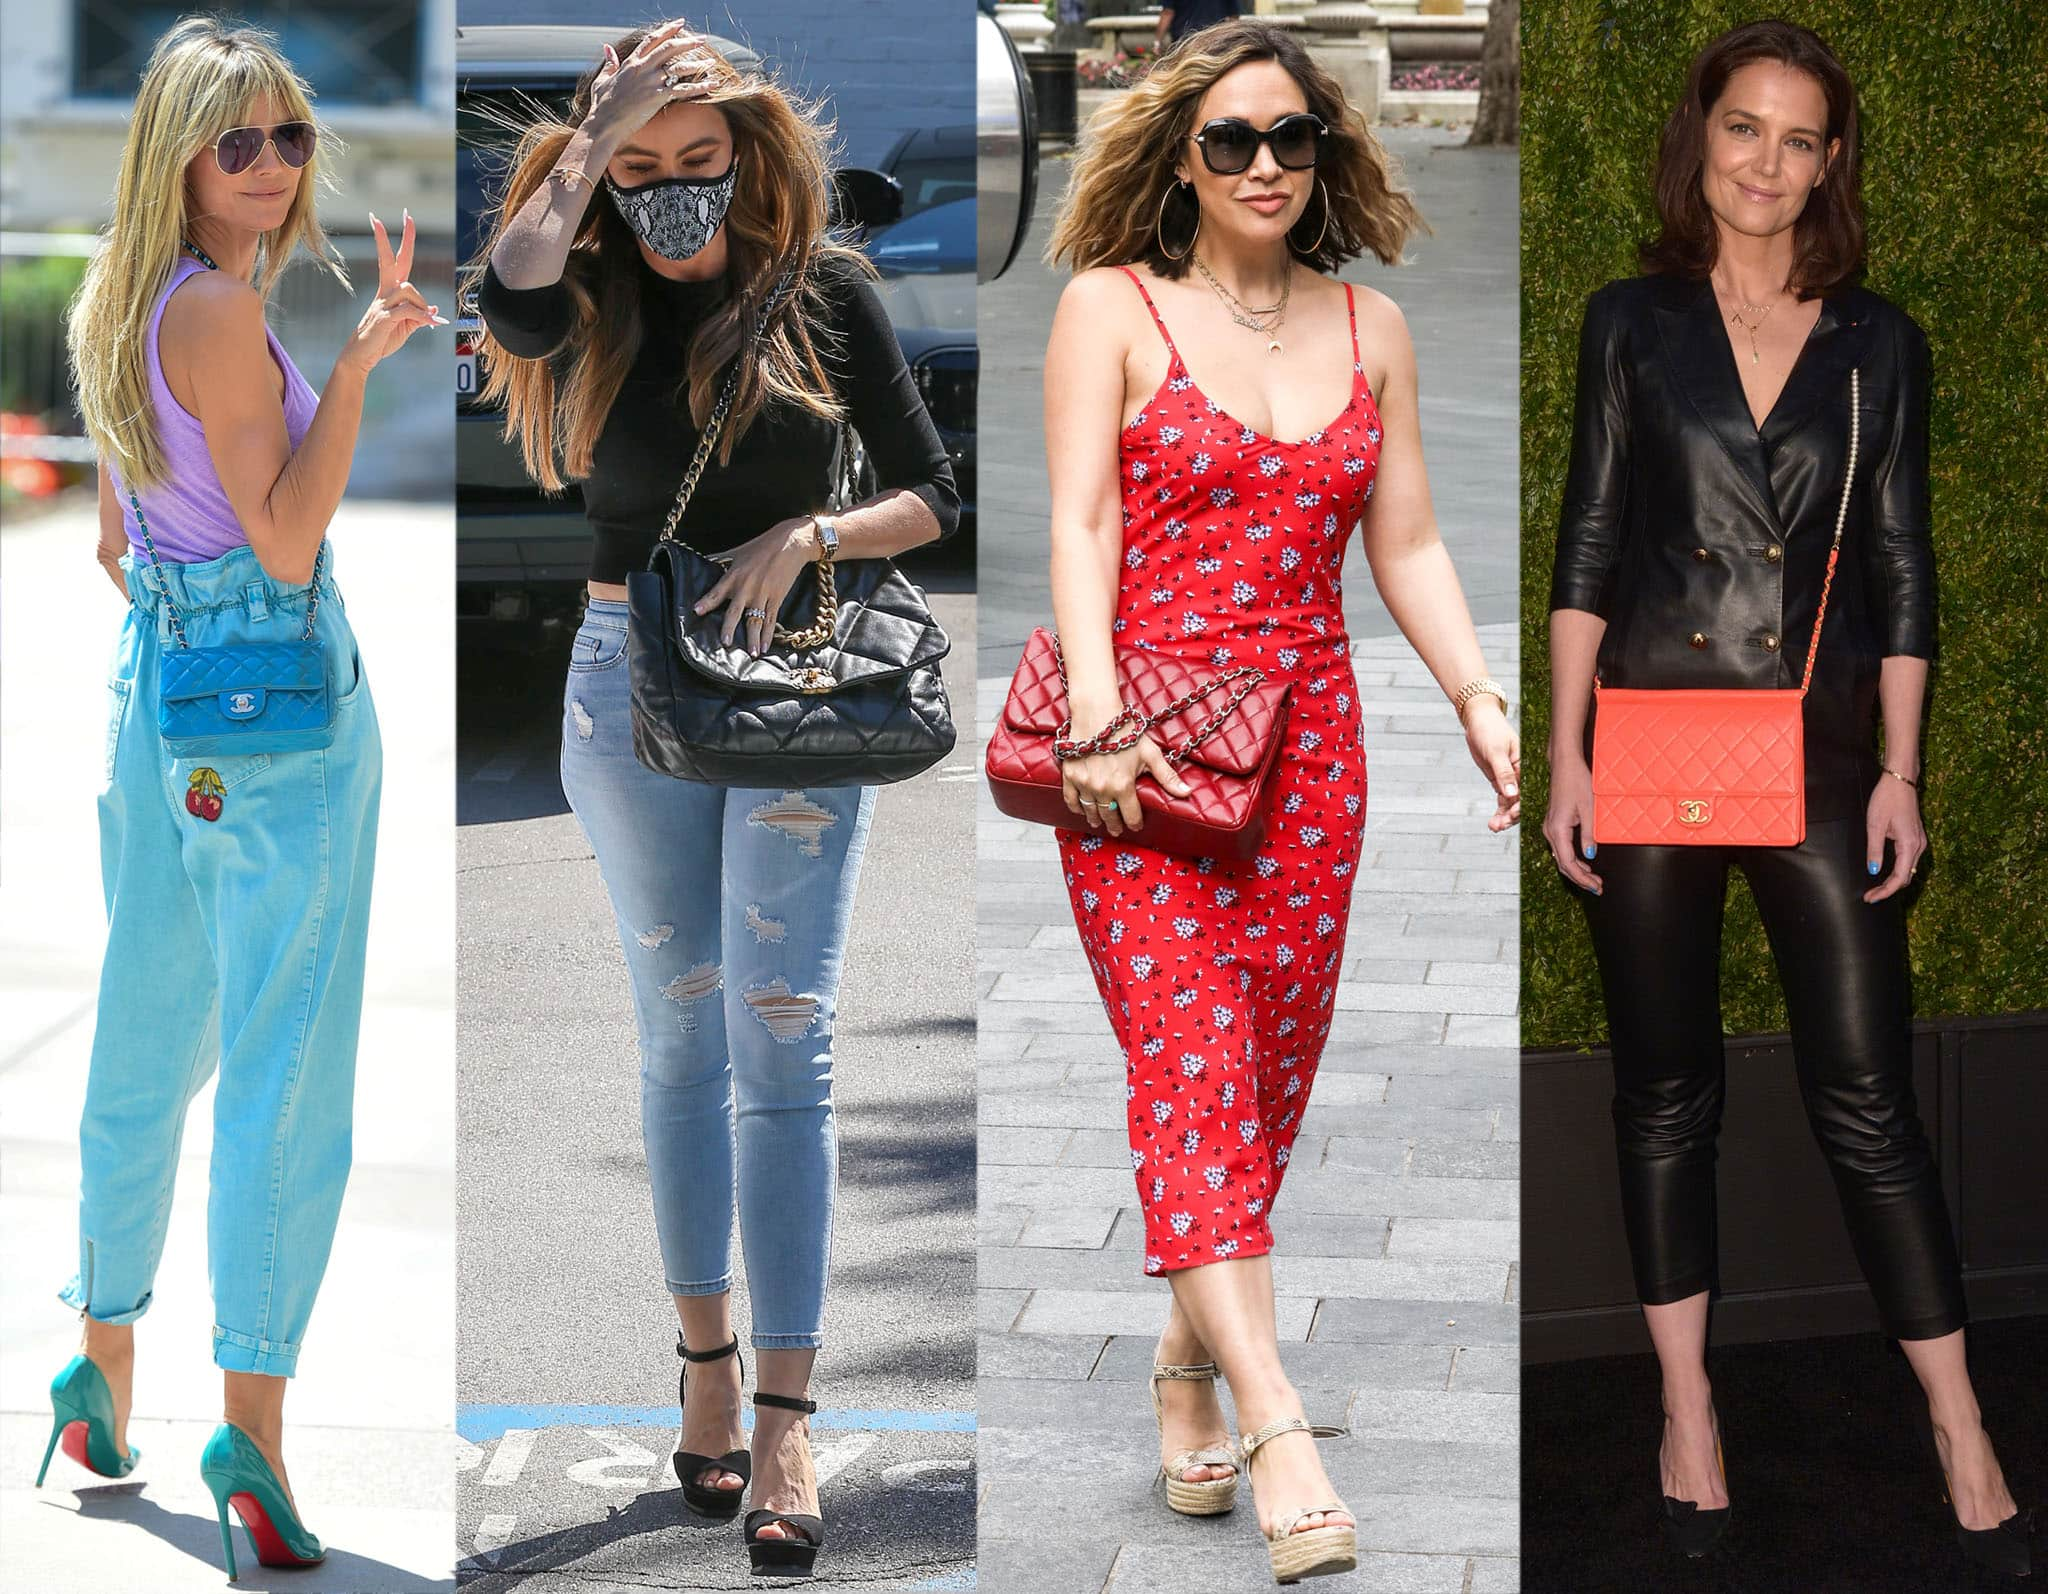 Heidi Klum, Sofia Vergara, Myleene Klass, and Katie Holmes carrying Chanel bags